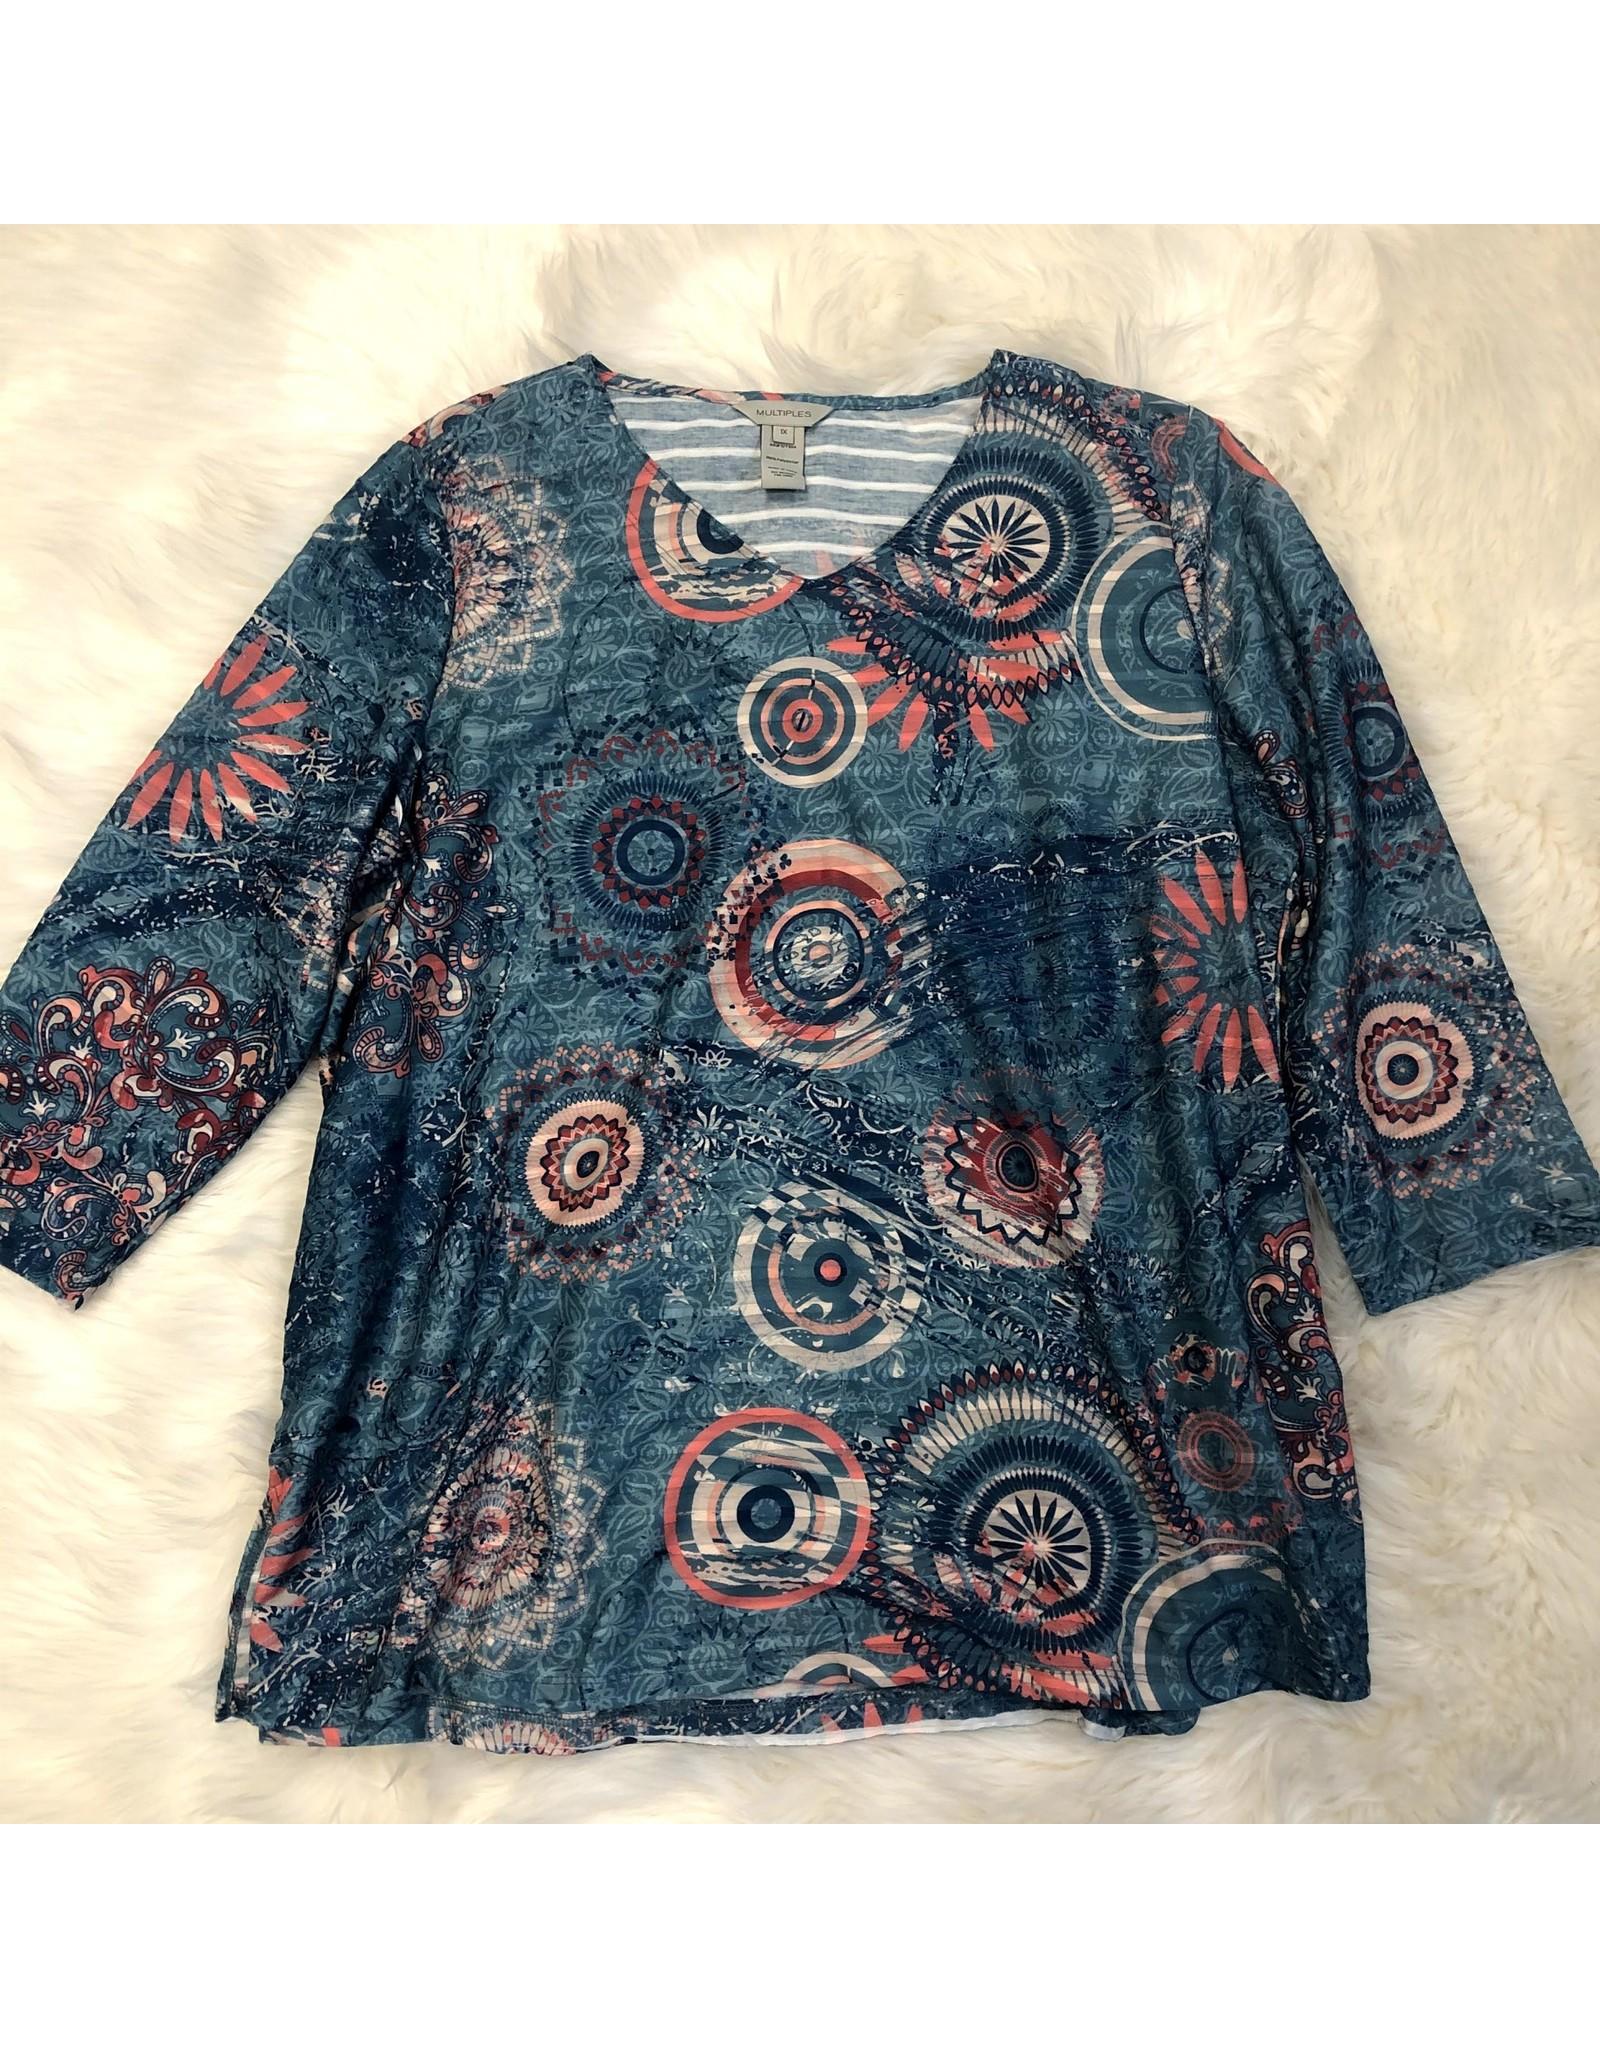 Jerell Clothing Company 3/4 Slv Sing Shape Knit Top 1XL